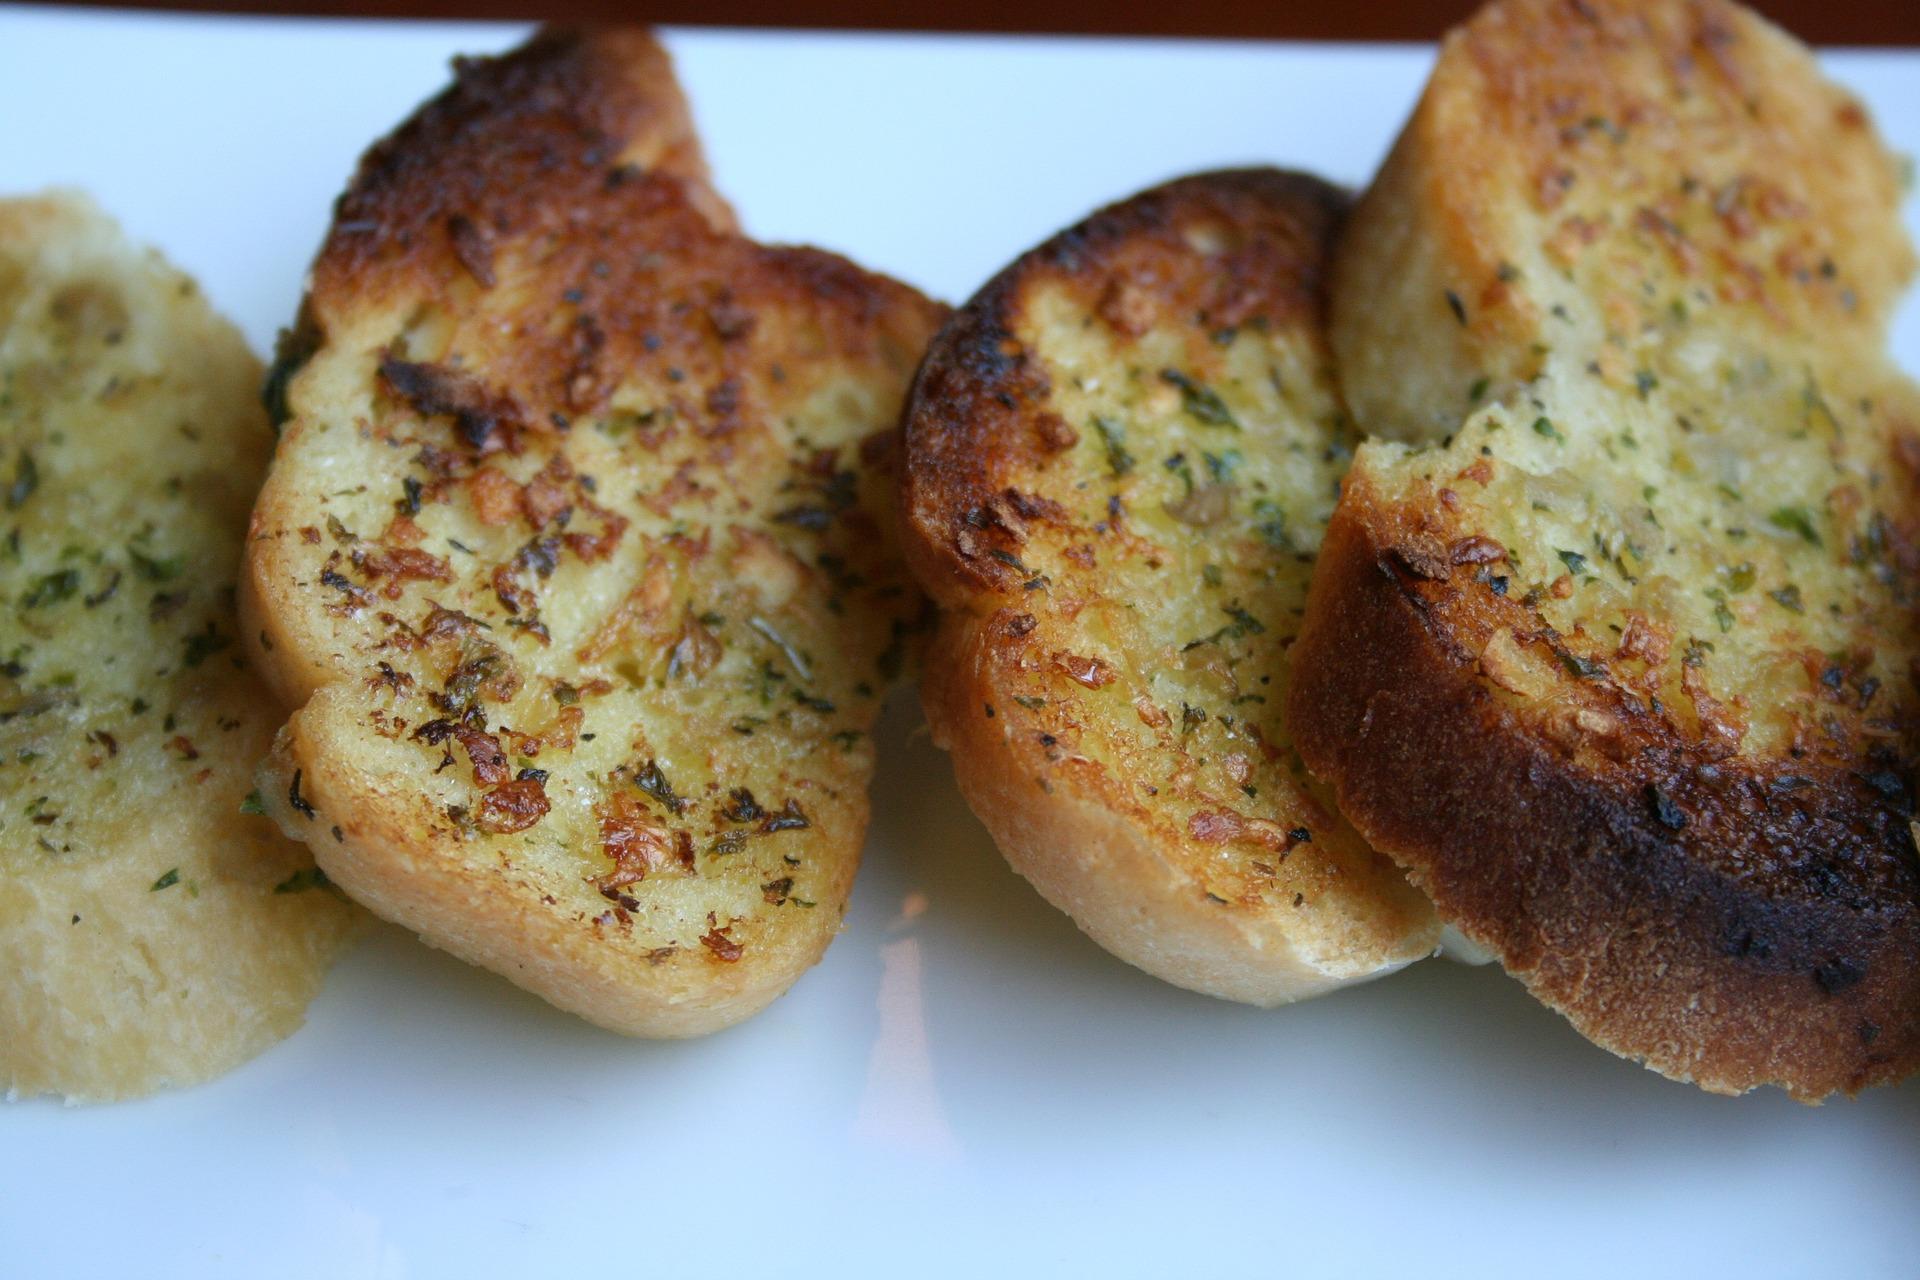 Gaelic Bread